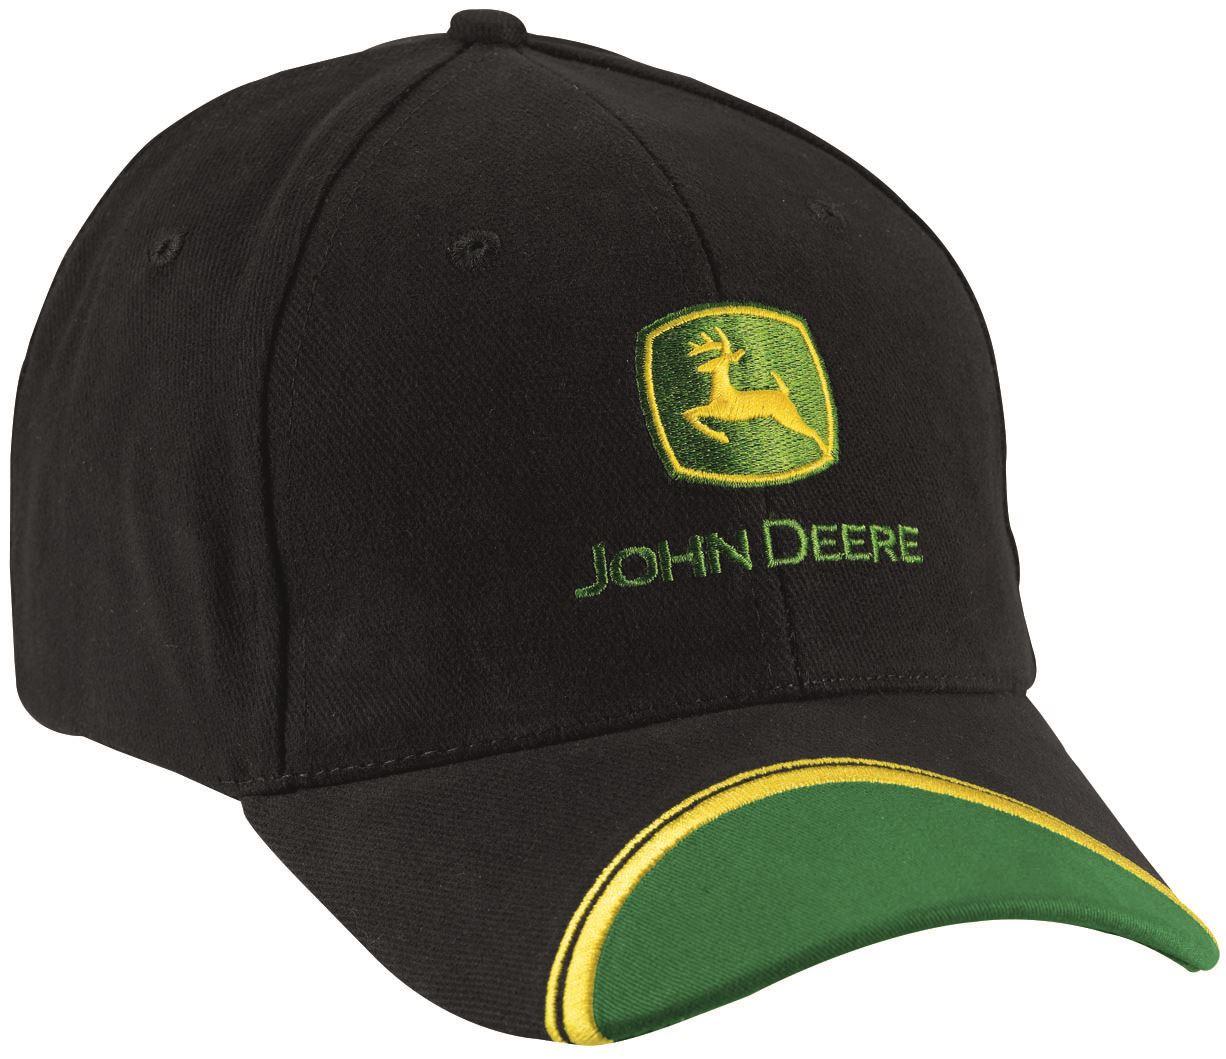 John Deere Black Cap : John deere wave cotton baseball cap hat green black ebay